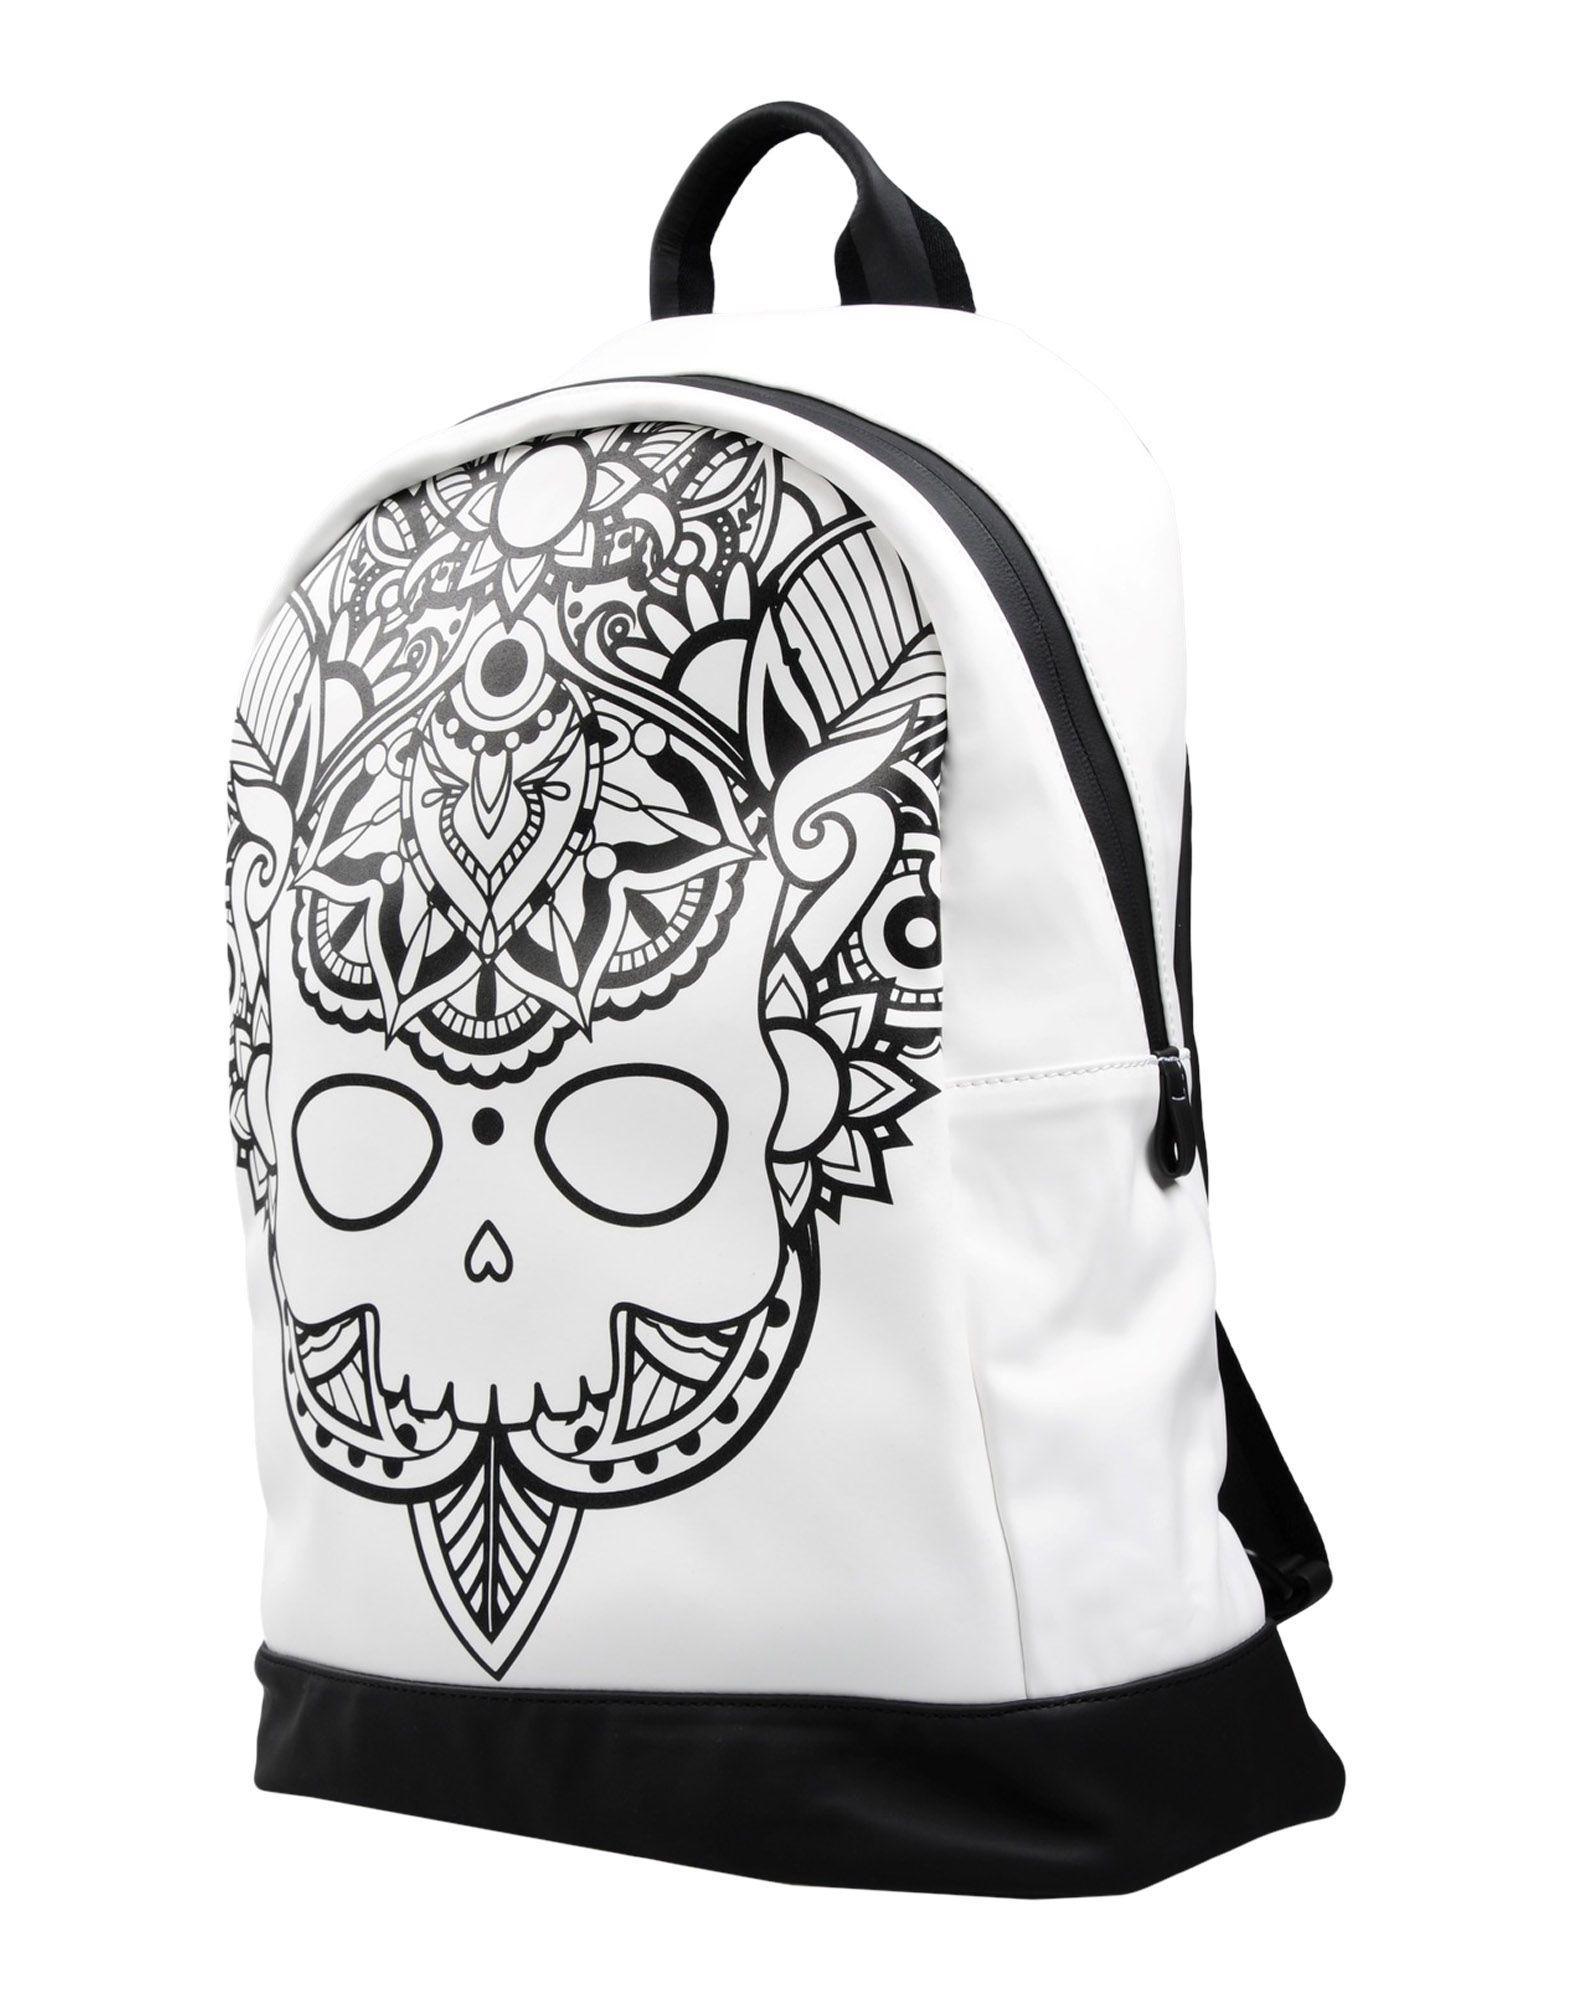 BAGS - Backpacks & Bum bags Hydrogen nHEpK